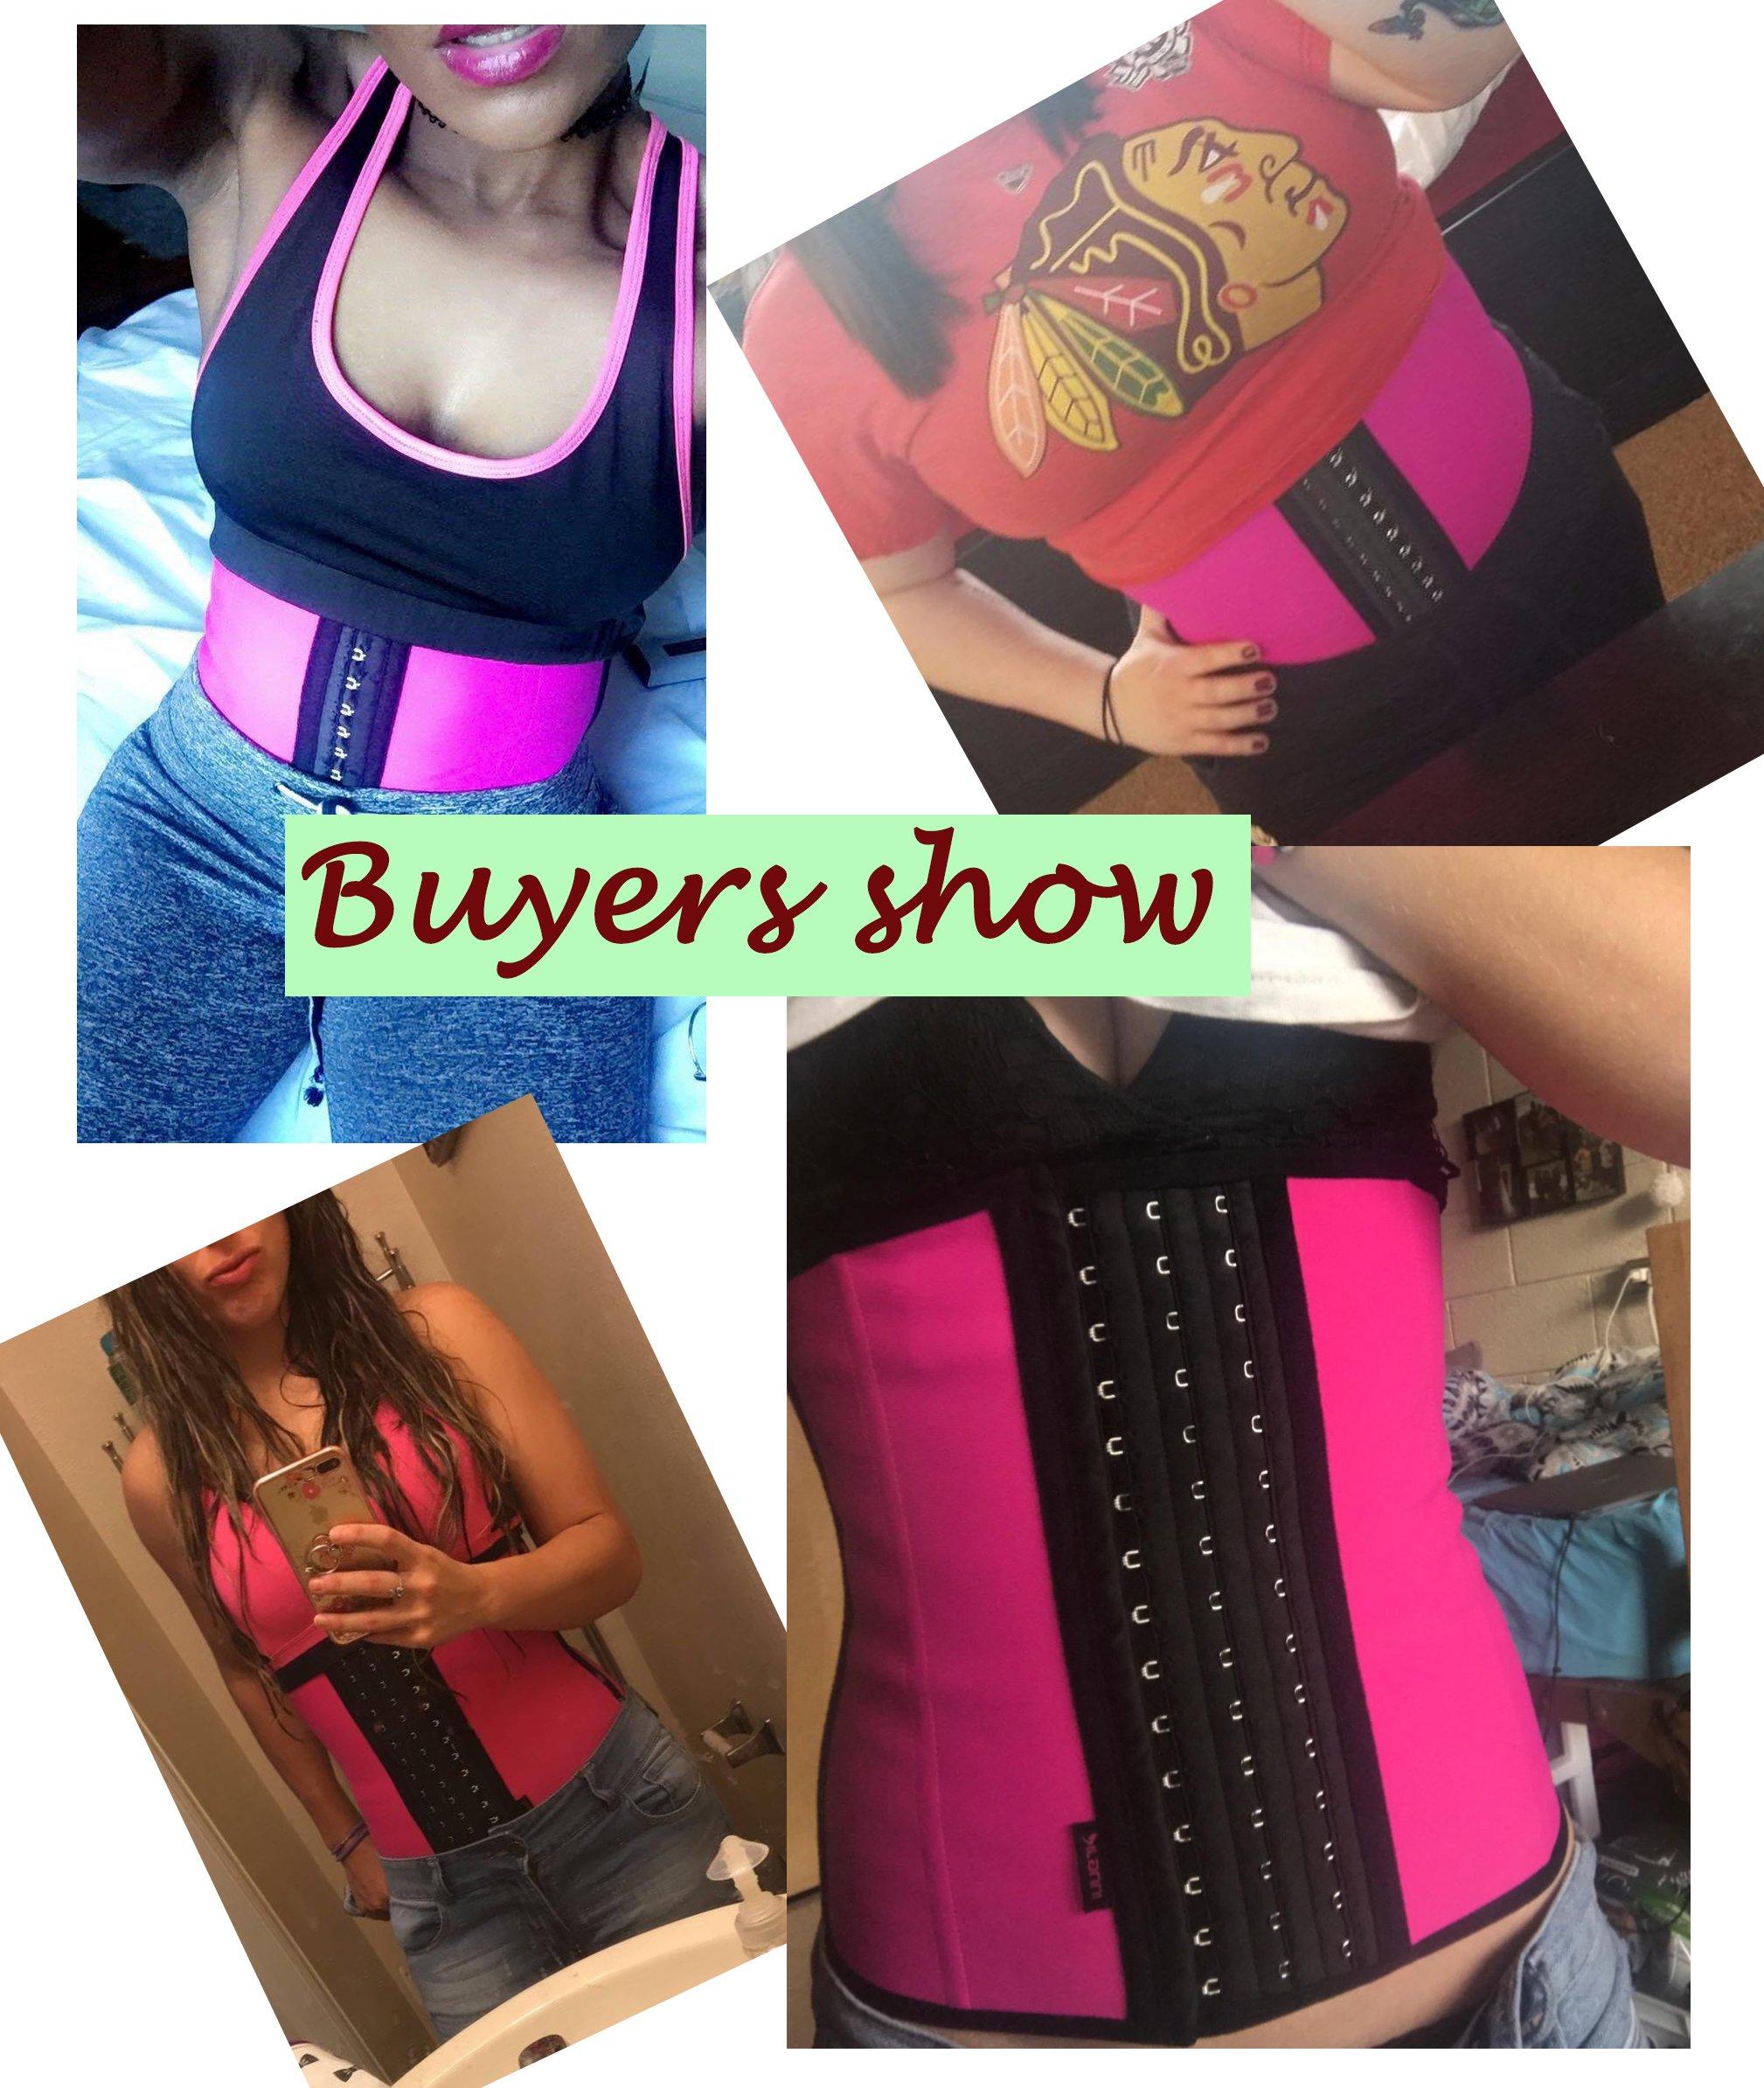 f81a0b135 DILANNI Women s Breathable Firm Control Shapewear with Elastic Corset Waist  Trainer Cincher Belt Pink M - LYSB01ELJEP6A-SPRTSEQIP   Waist Cinchers ...